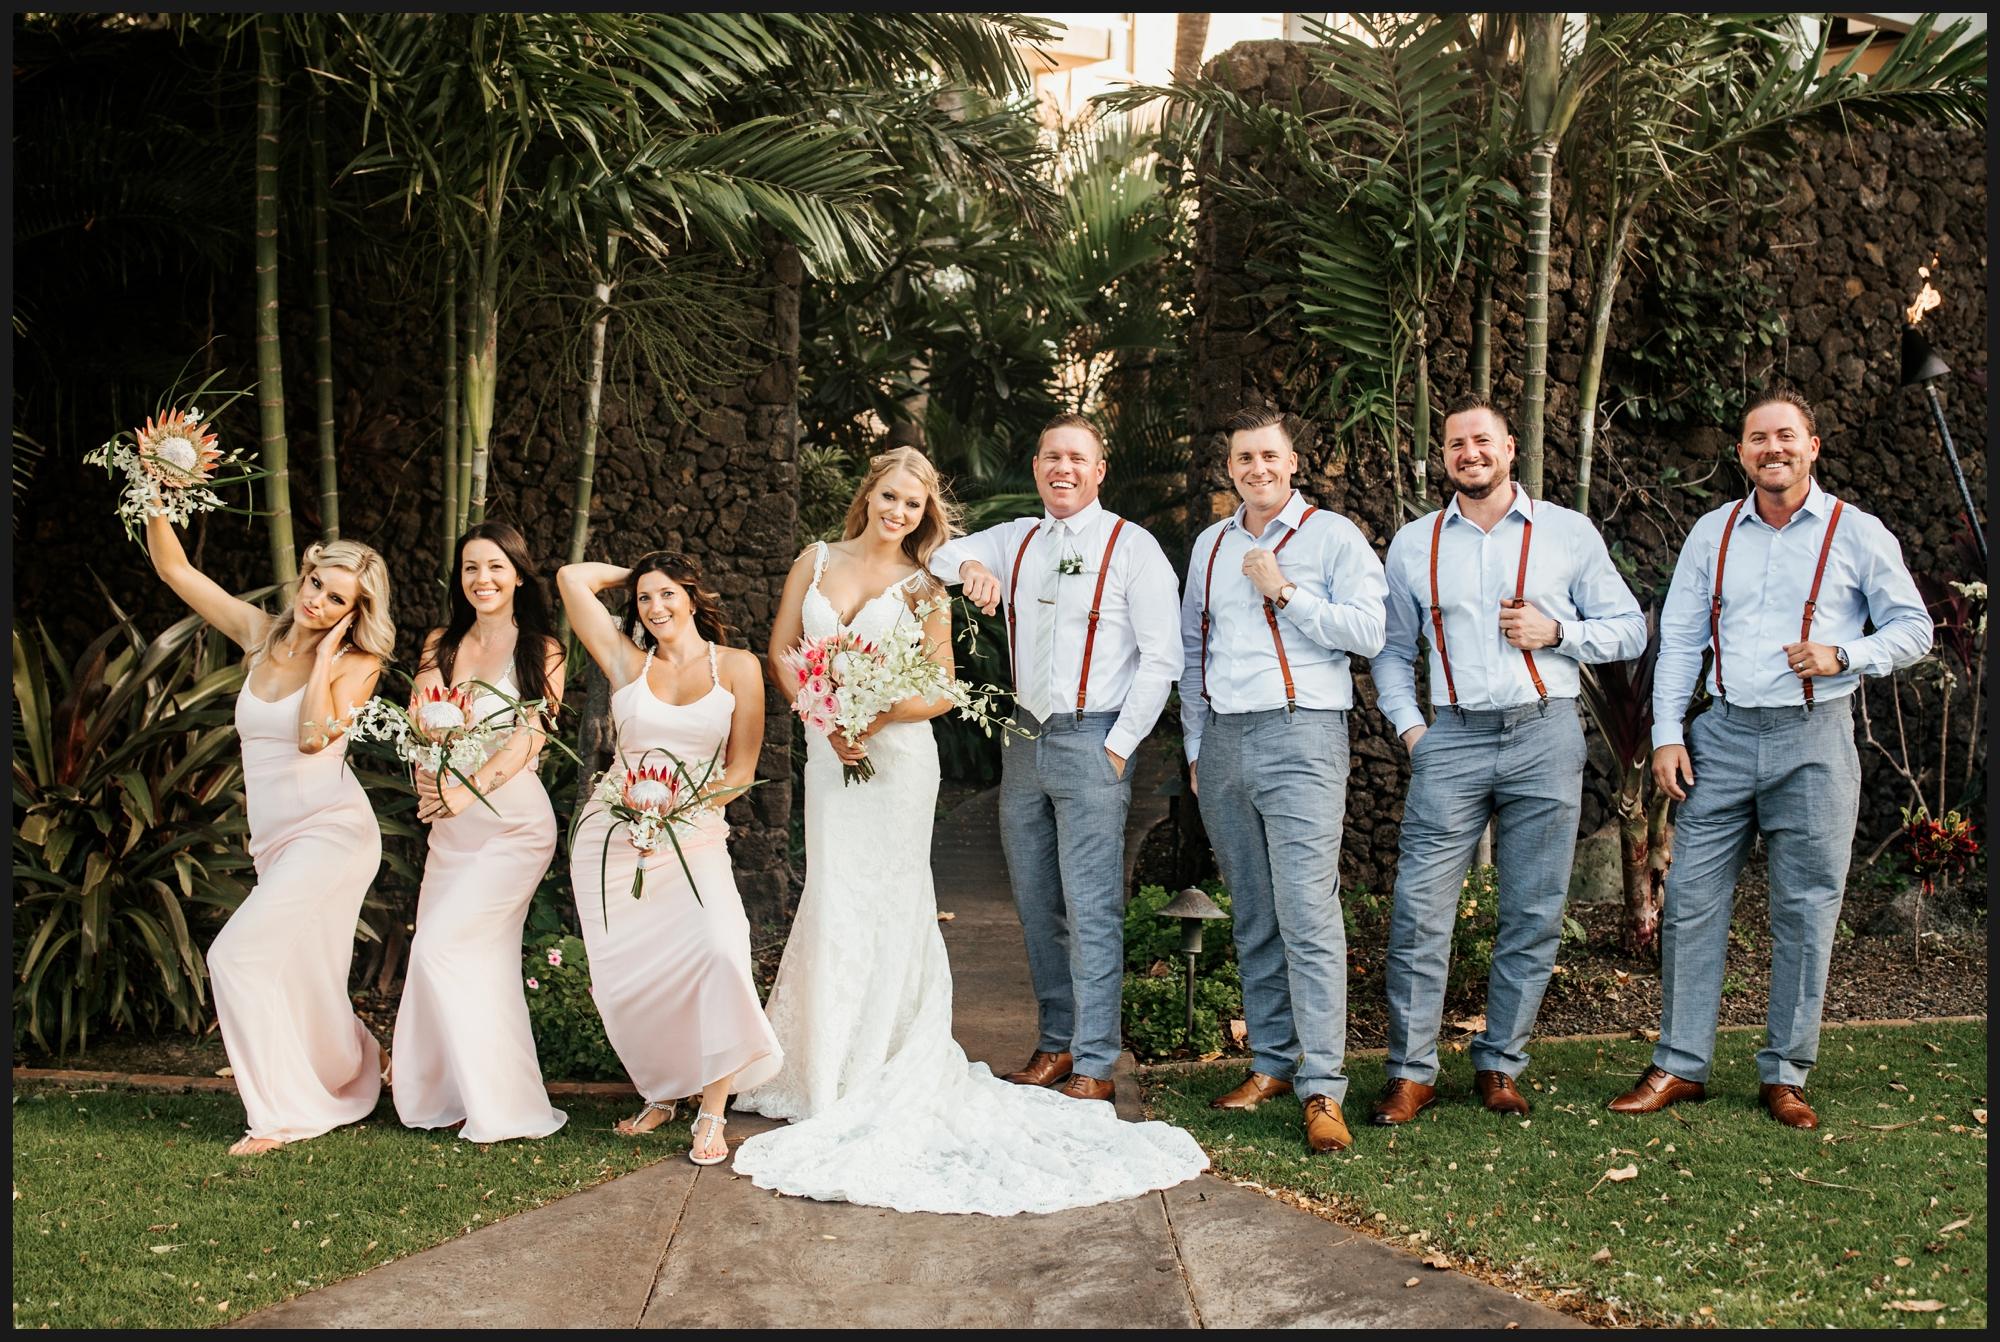 Orlando-Wedding-Photographer-destination-wedding-photographer-florida-wedding-photographer-hawaii-wedding-photographer_0068.jpg